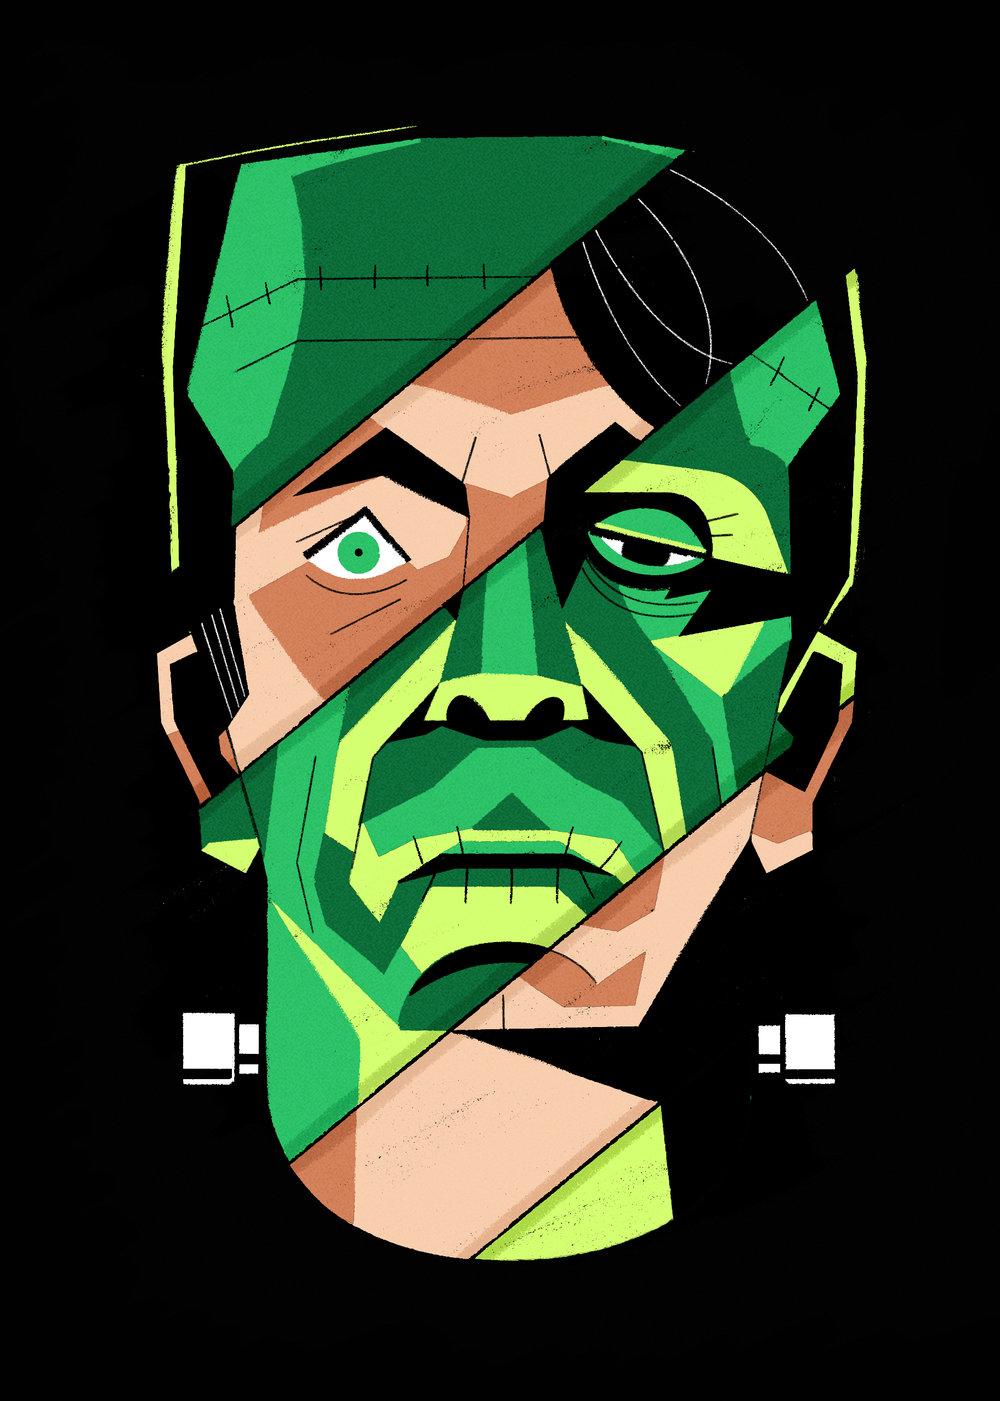 dale edwin murray freelance illustrator adobe inktober halloween frankenstein editorial conceptual illustration